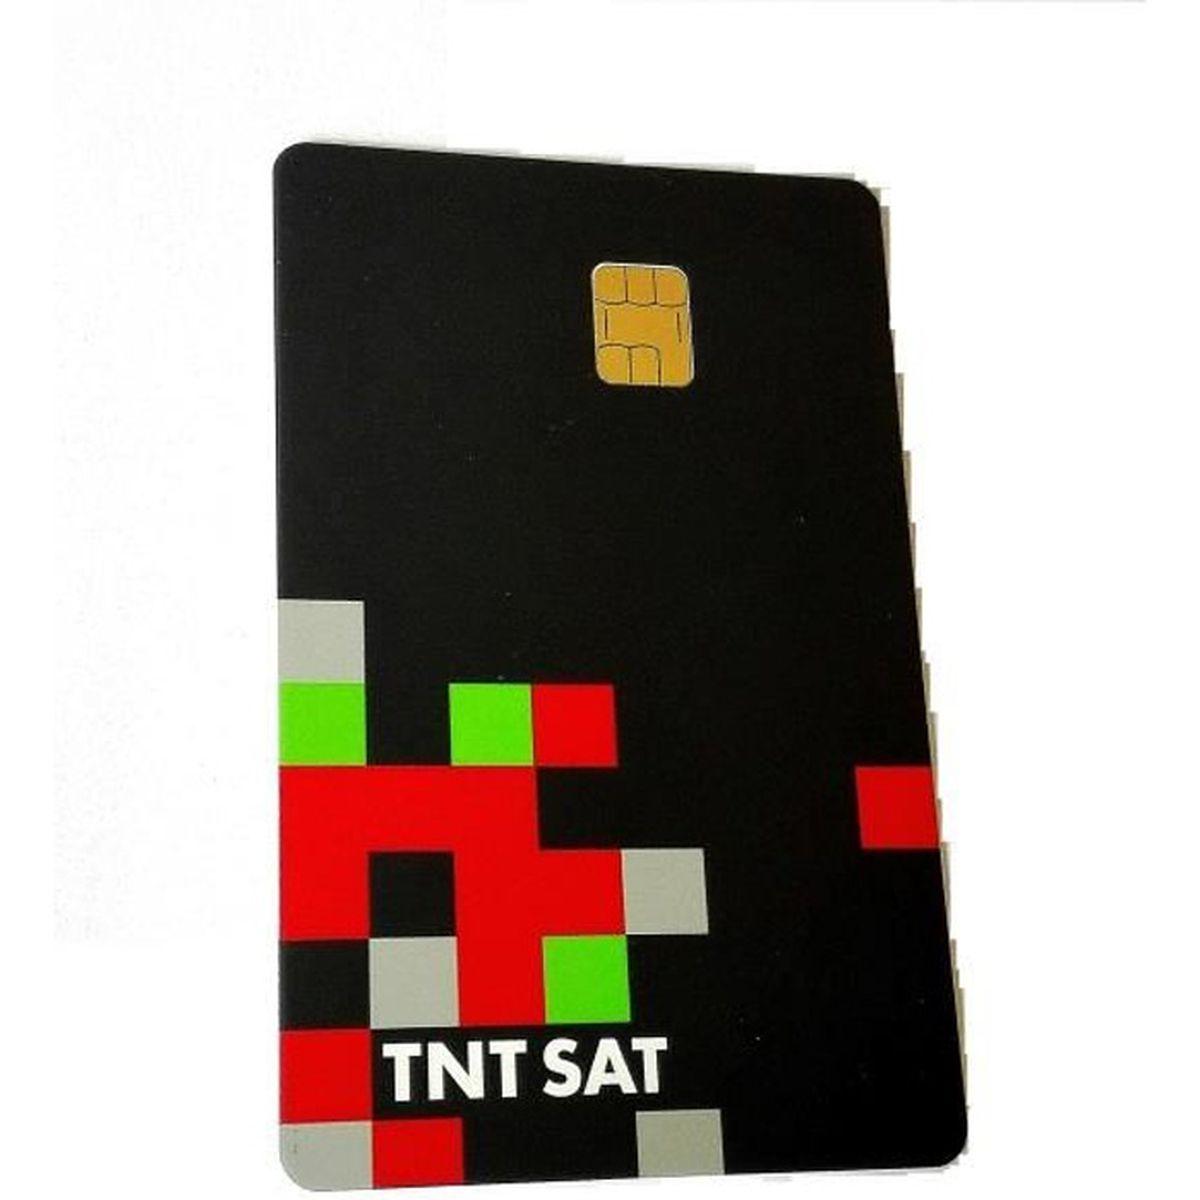 acheter carte tnt sat Carte TNTSAT V6 NEW Génération Neuve CANAL+ Astra 19,2